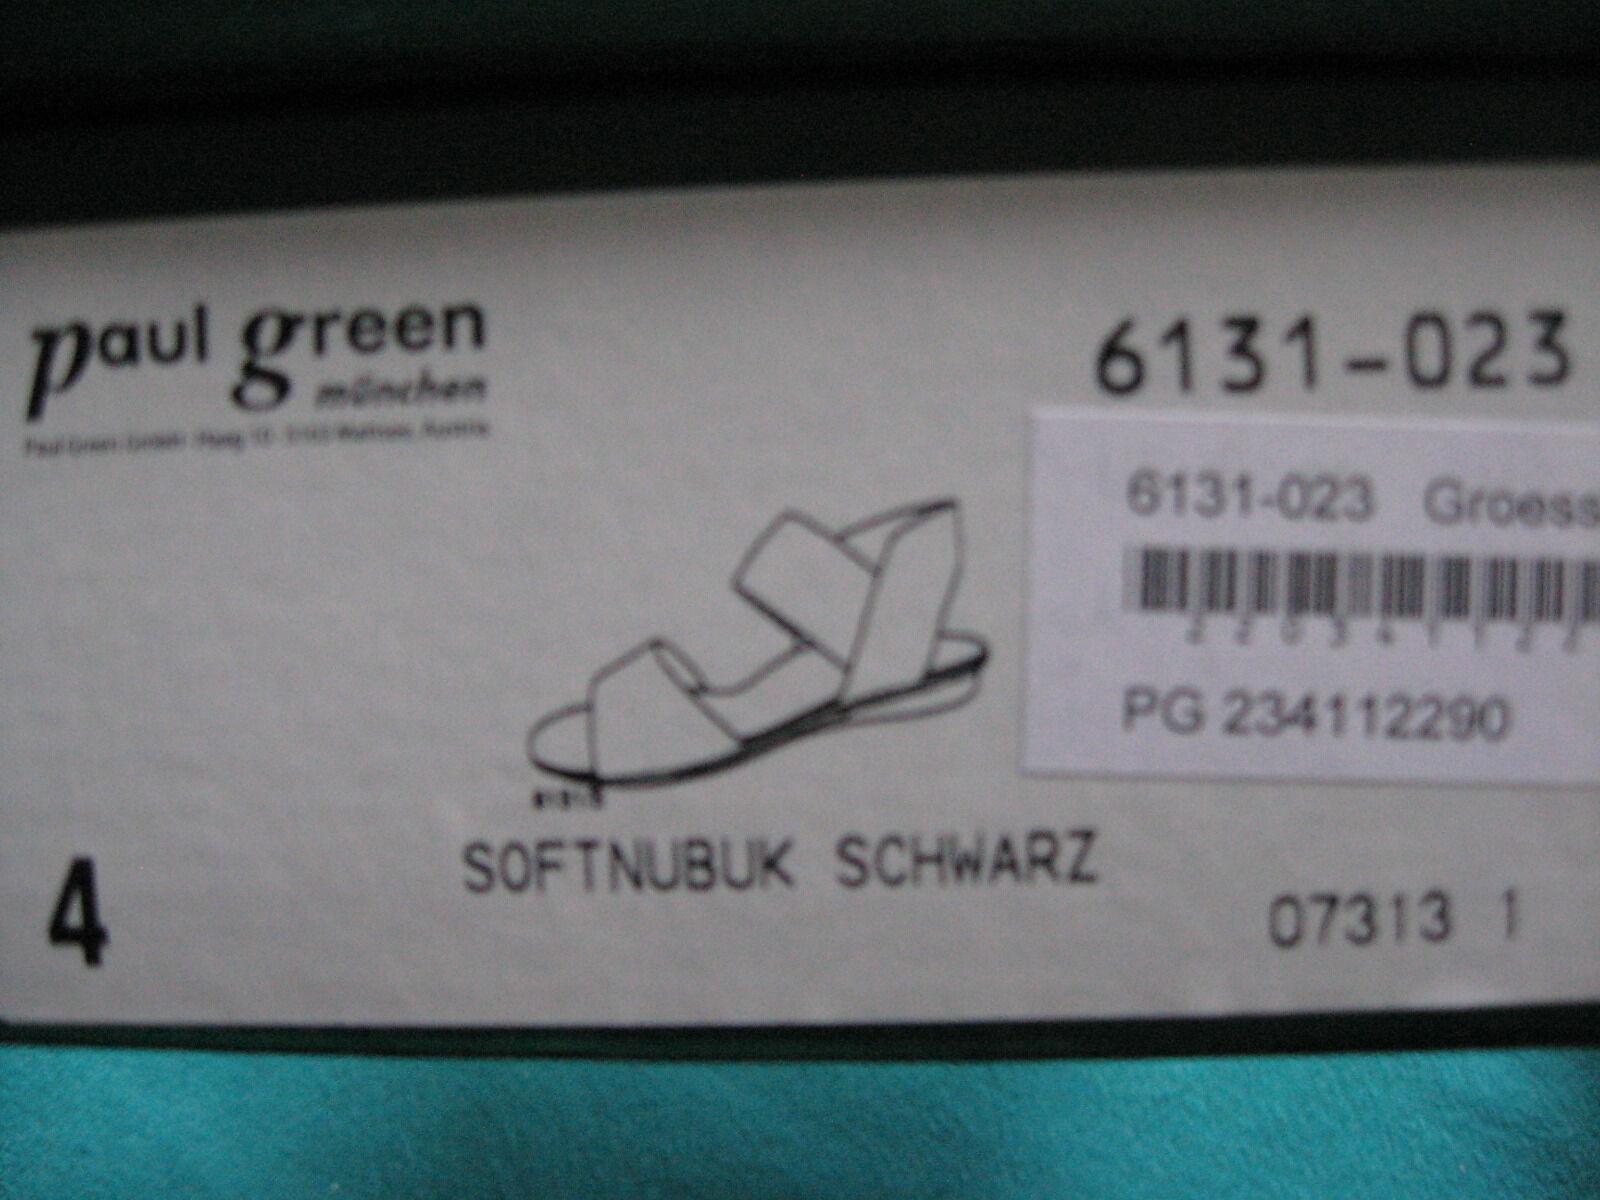 Paul Grün Damenpumps Sandaletten 6131-023, Größe 37, Softnubuk Softnubuk Softnubuk schwarz, flach b79f8e